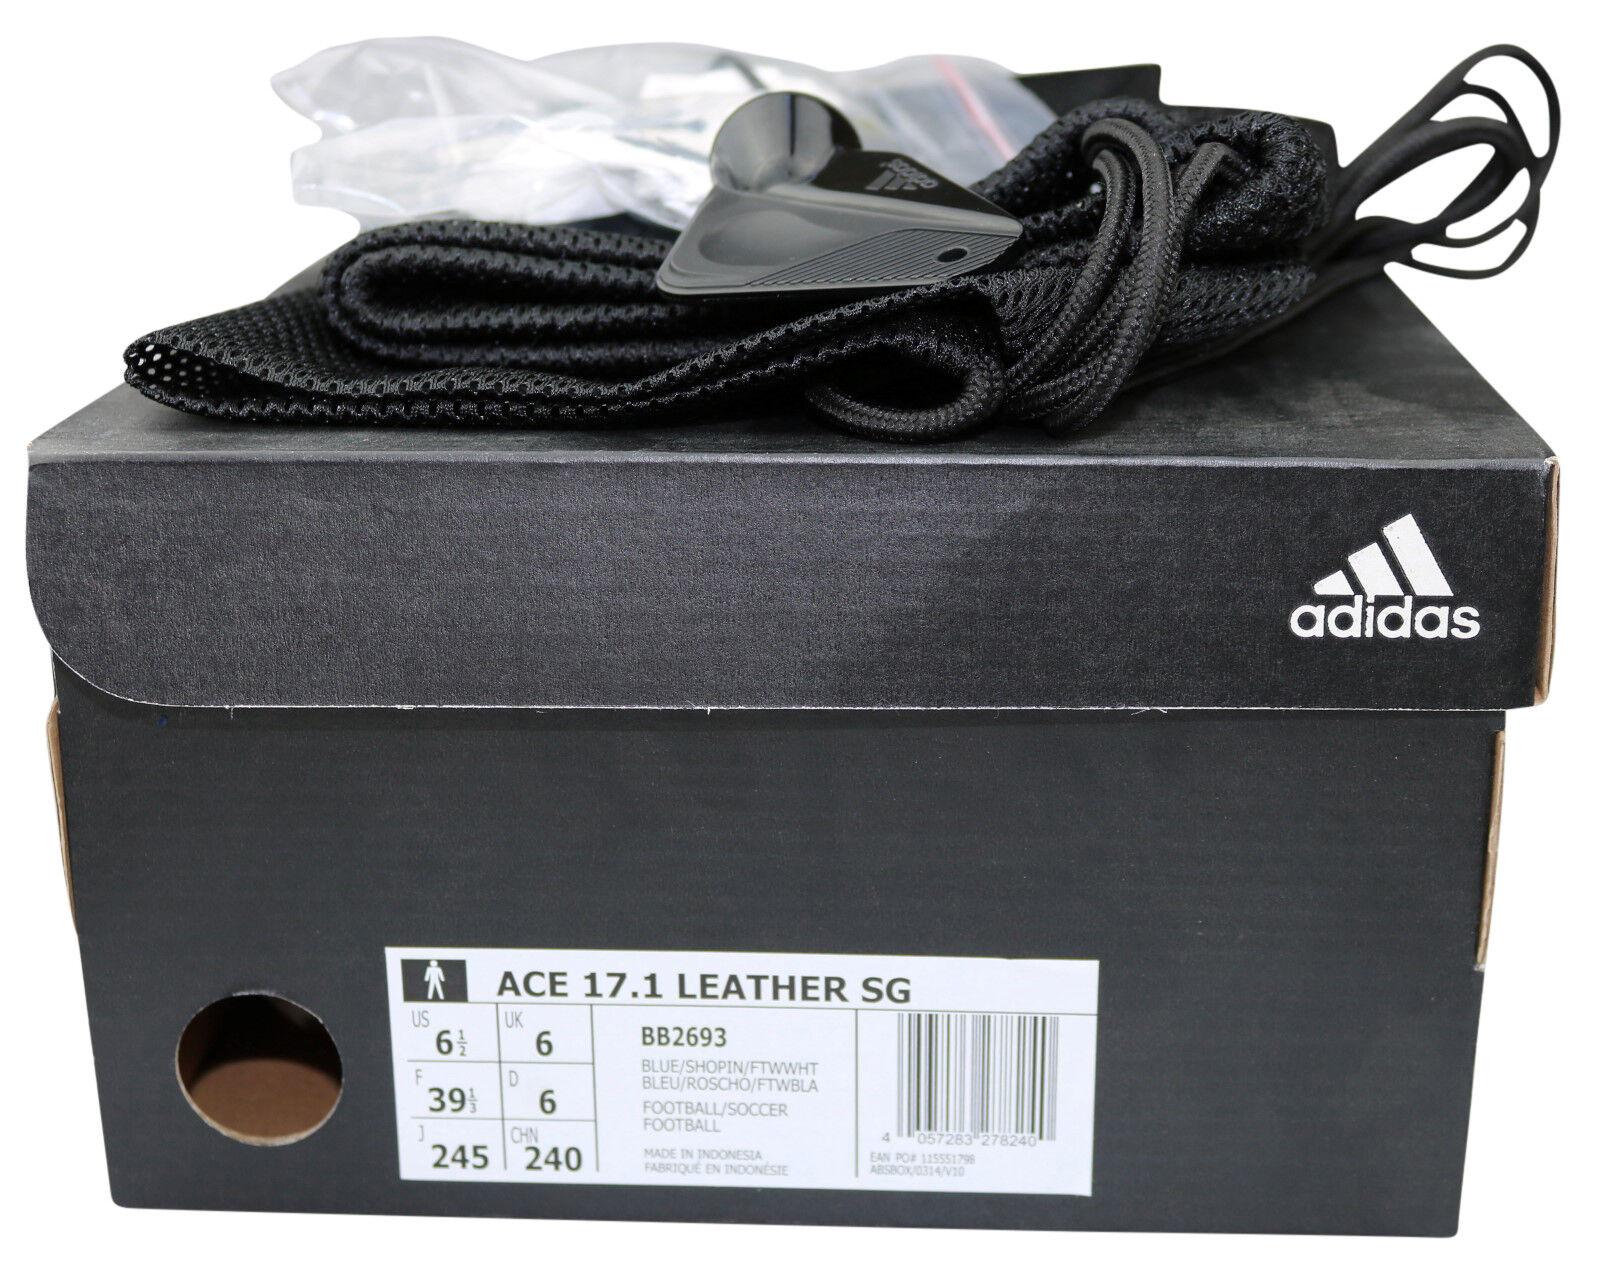 Adidas ACE 17.1 17.1 17.1 SG Fußballschuhe BB2693 Leder Stollen Gr. 39 - 48 2 3 NEU & OVP 8cdc00